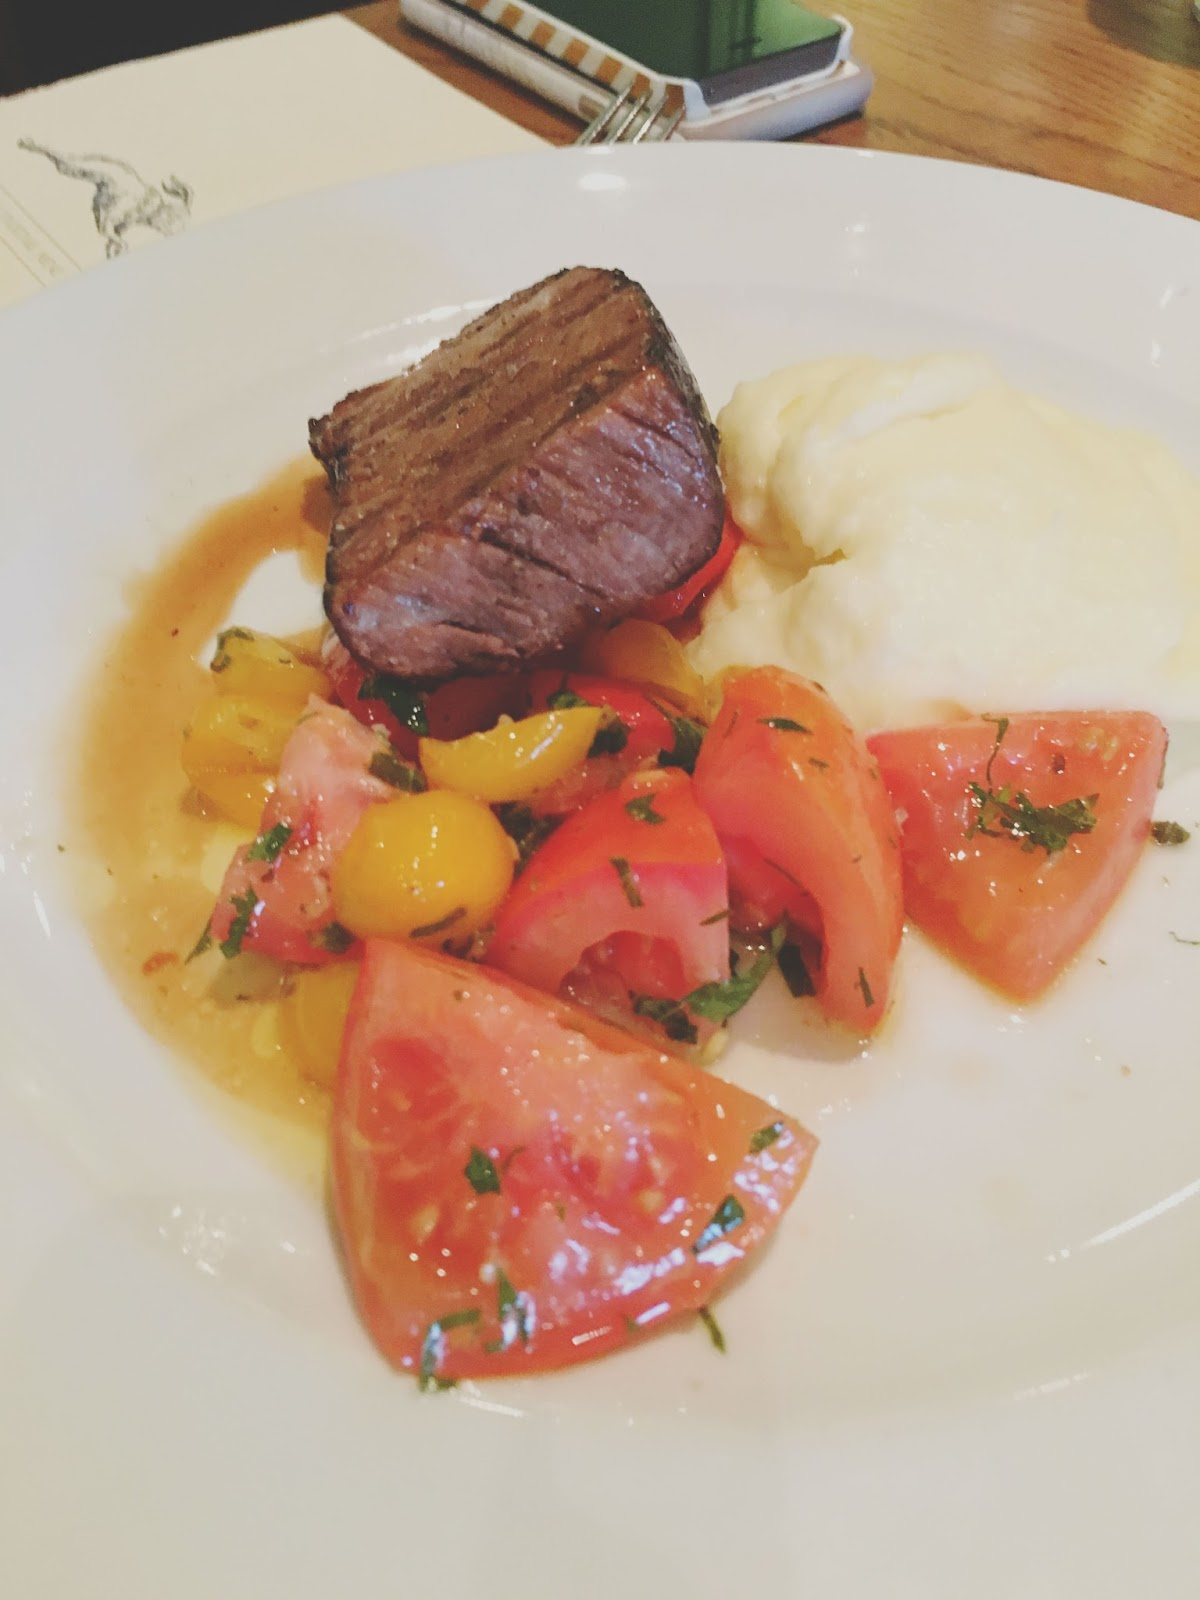 short rib at Hunky Dory - A restaurant in Houston, Texas